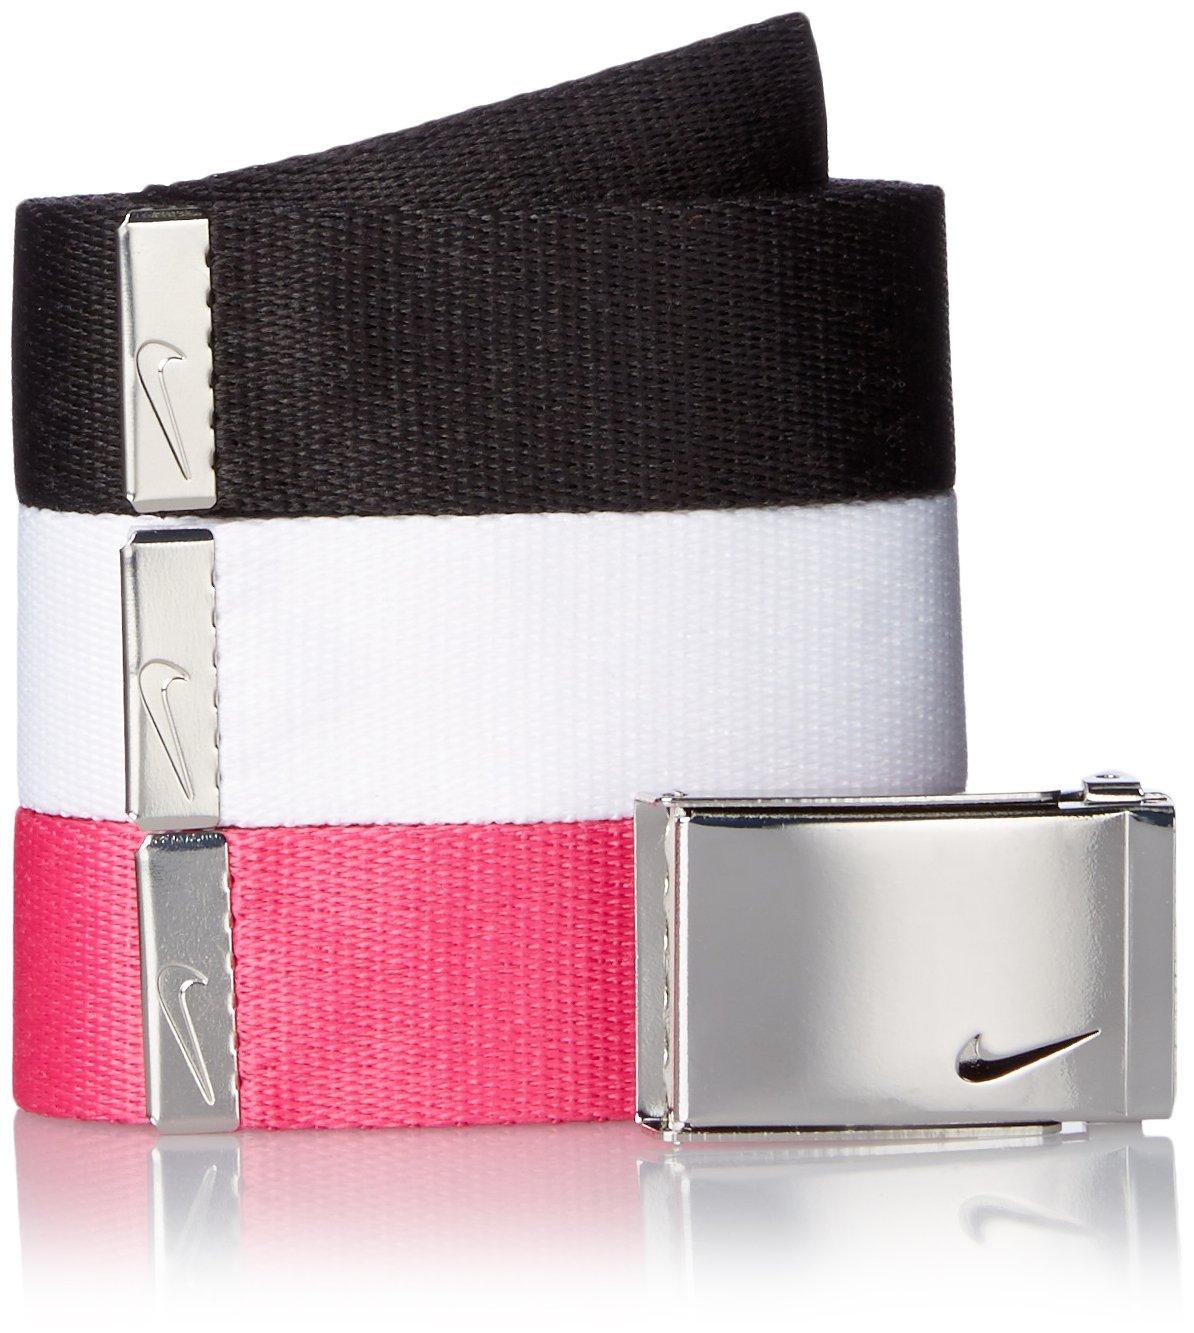 Nike Women's 3-In-1 Web Belt Pack, Black/White/Vivid Pink, One Size